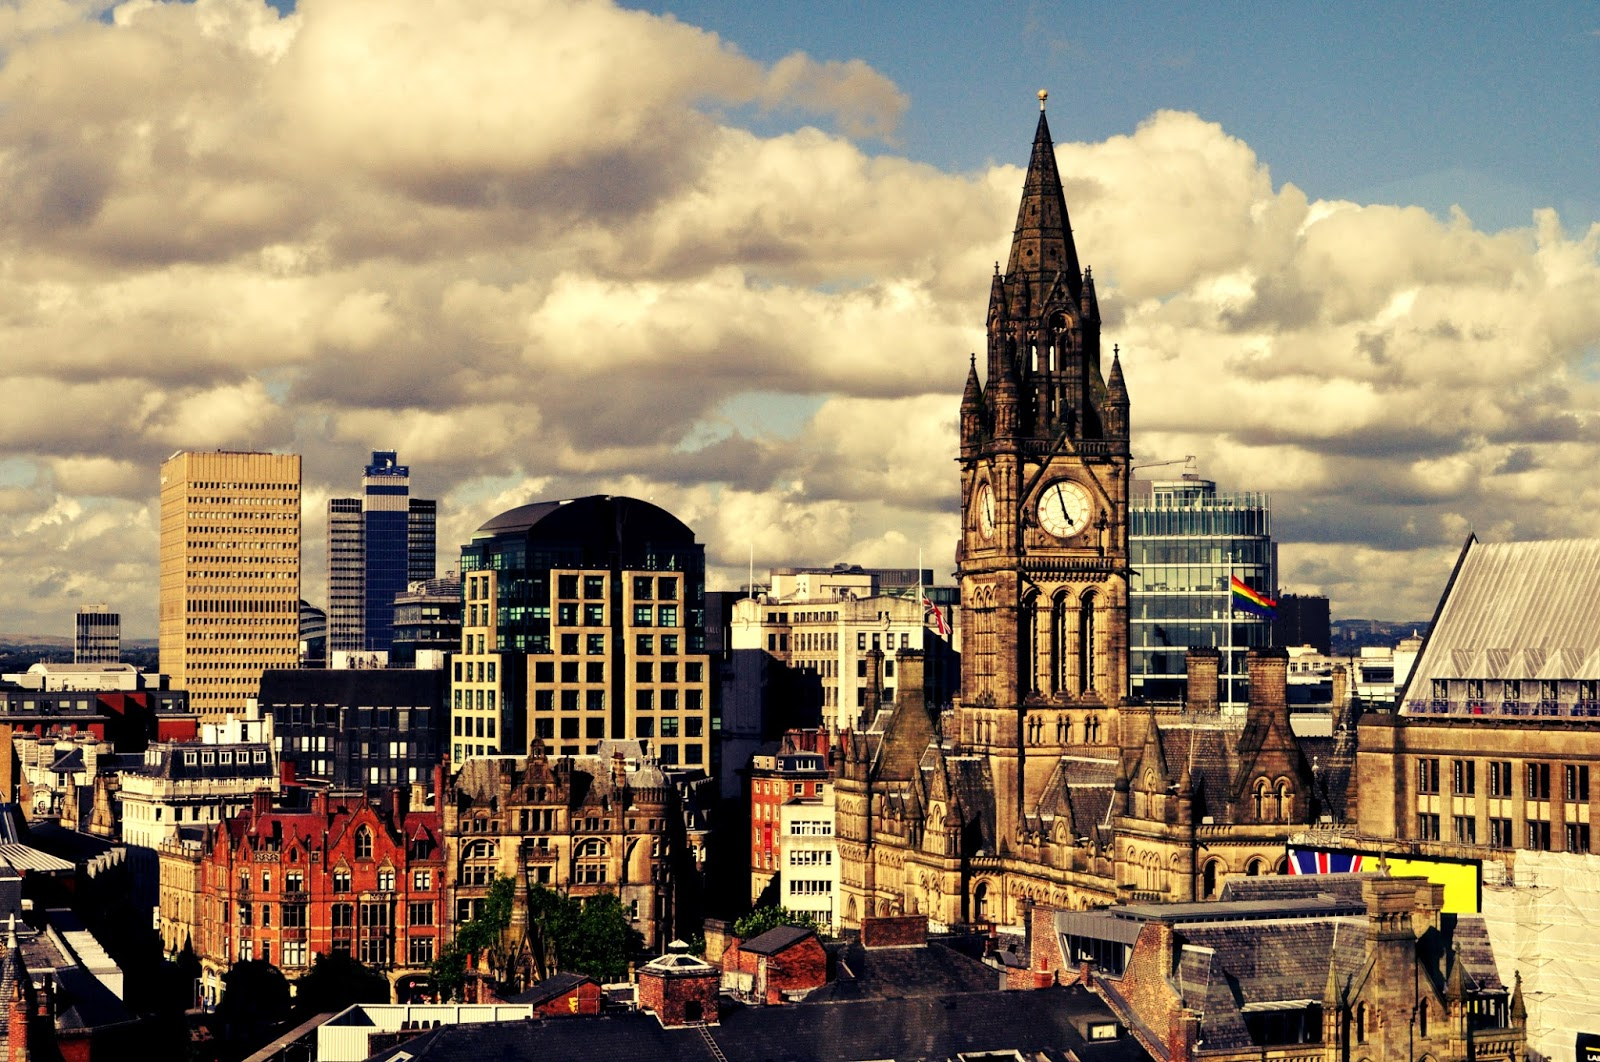 Inghilterra: Vietato dire che Manchester è brutta   Emotion Recollected in  Tranquillity